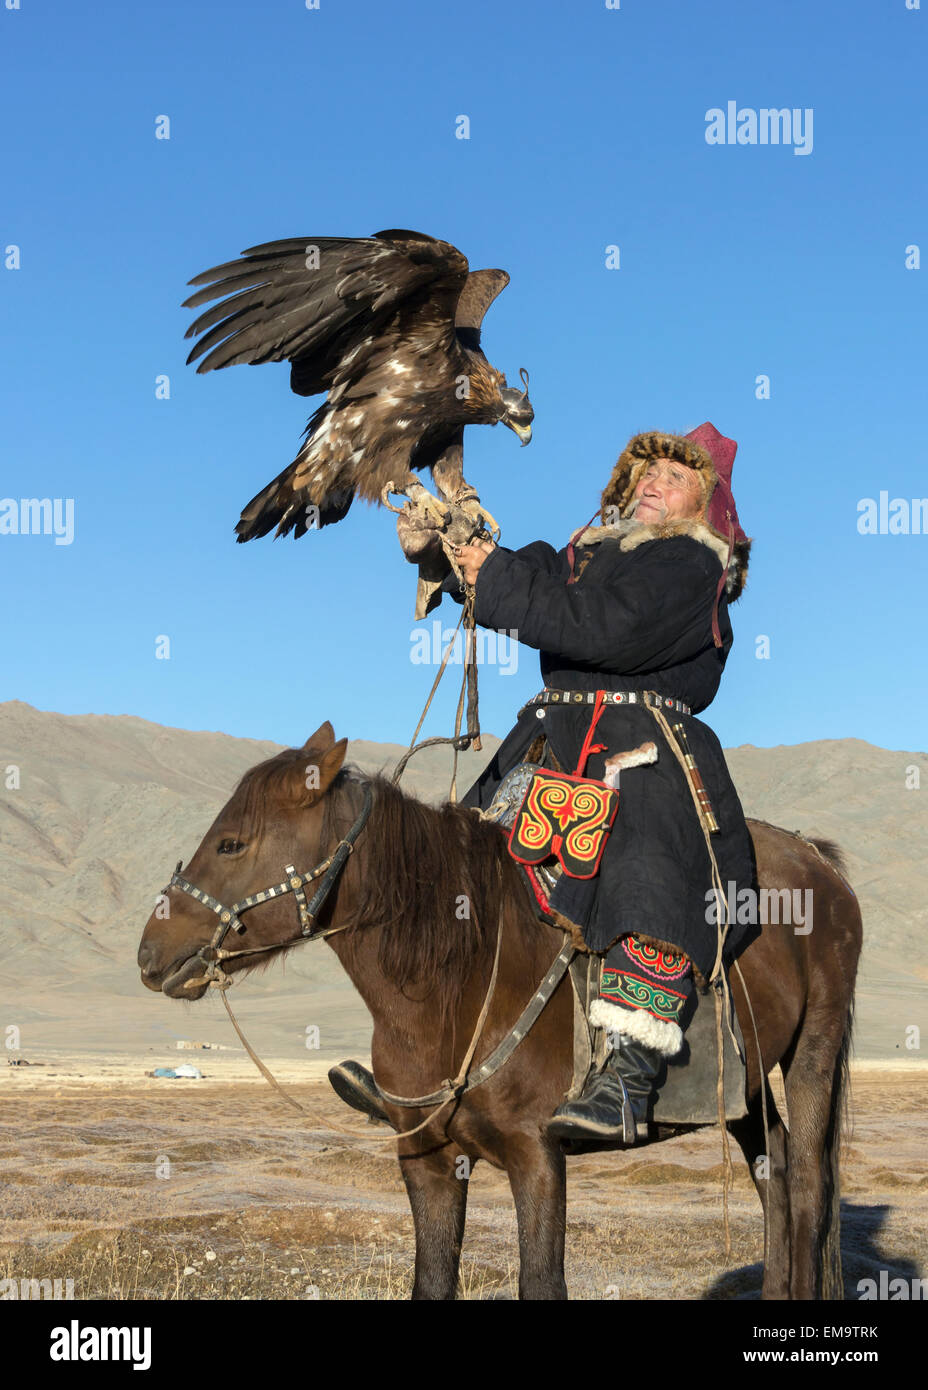 Elder Kazakh eagle hunter posing with his eagle and his horse #1, Western Mongolia Stock Photo